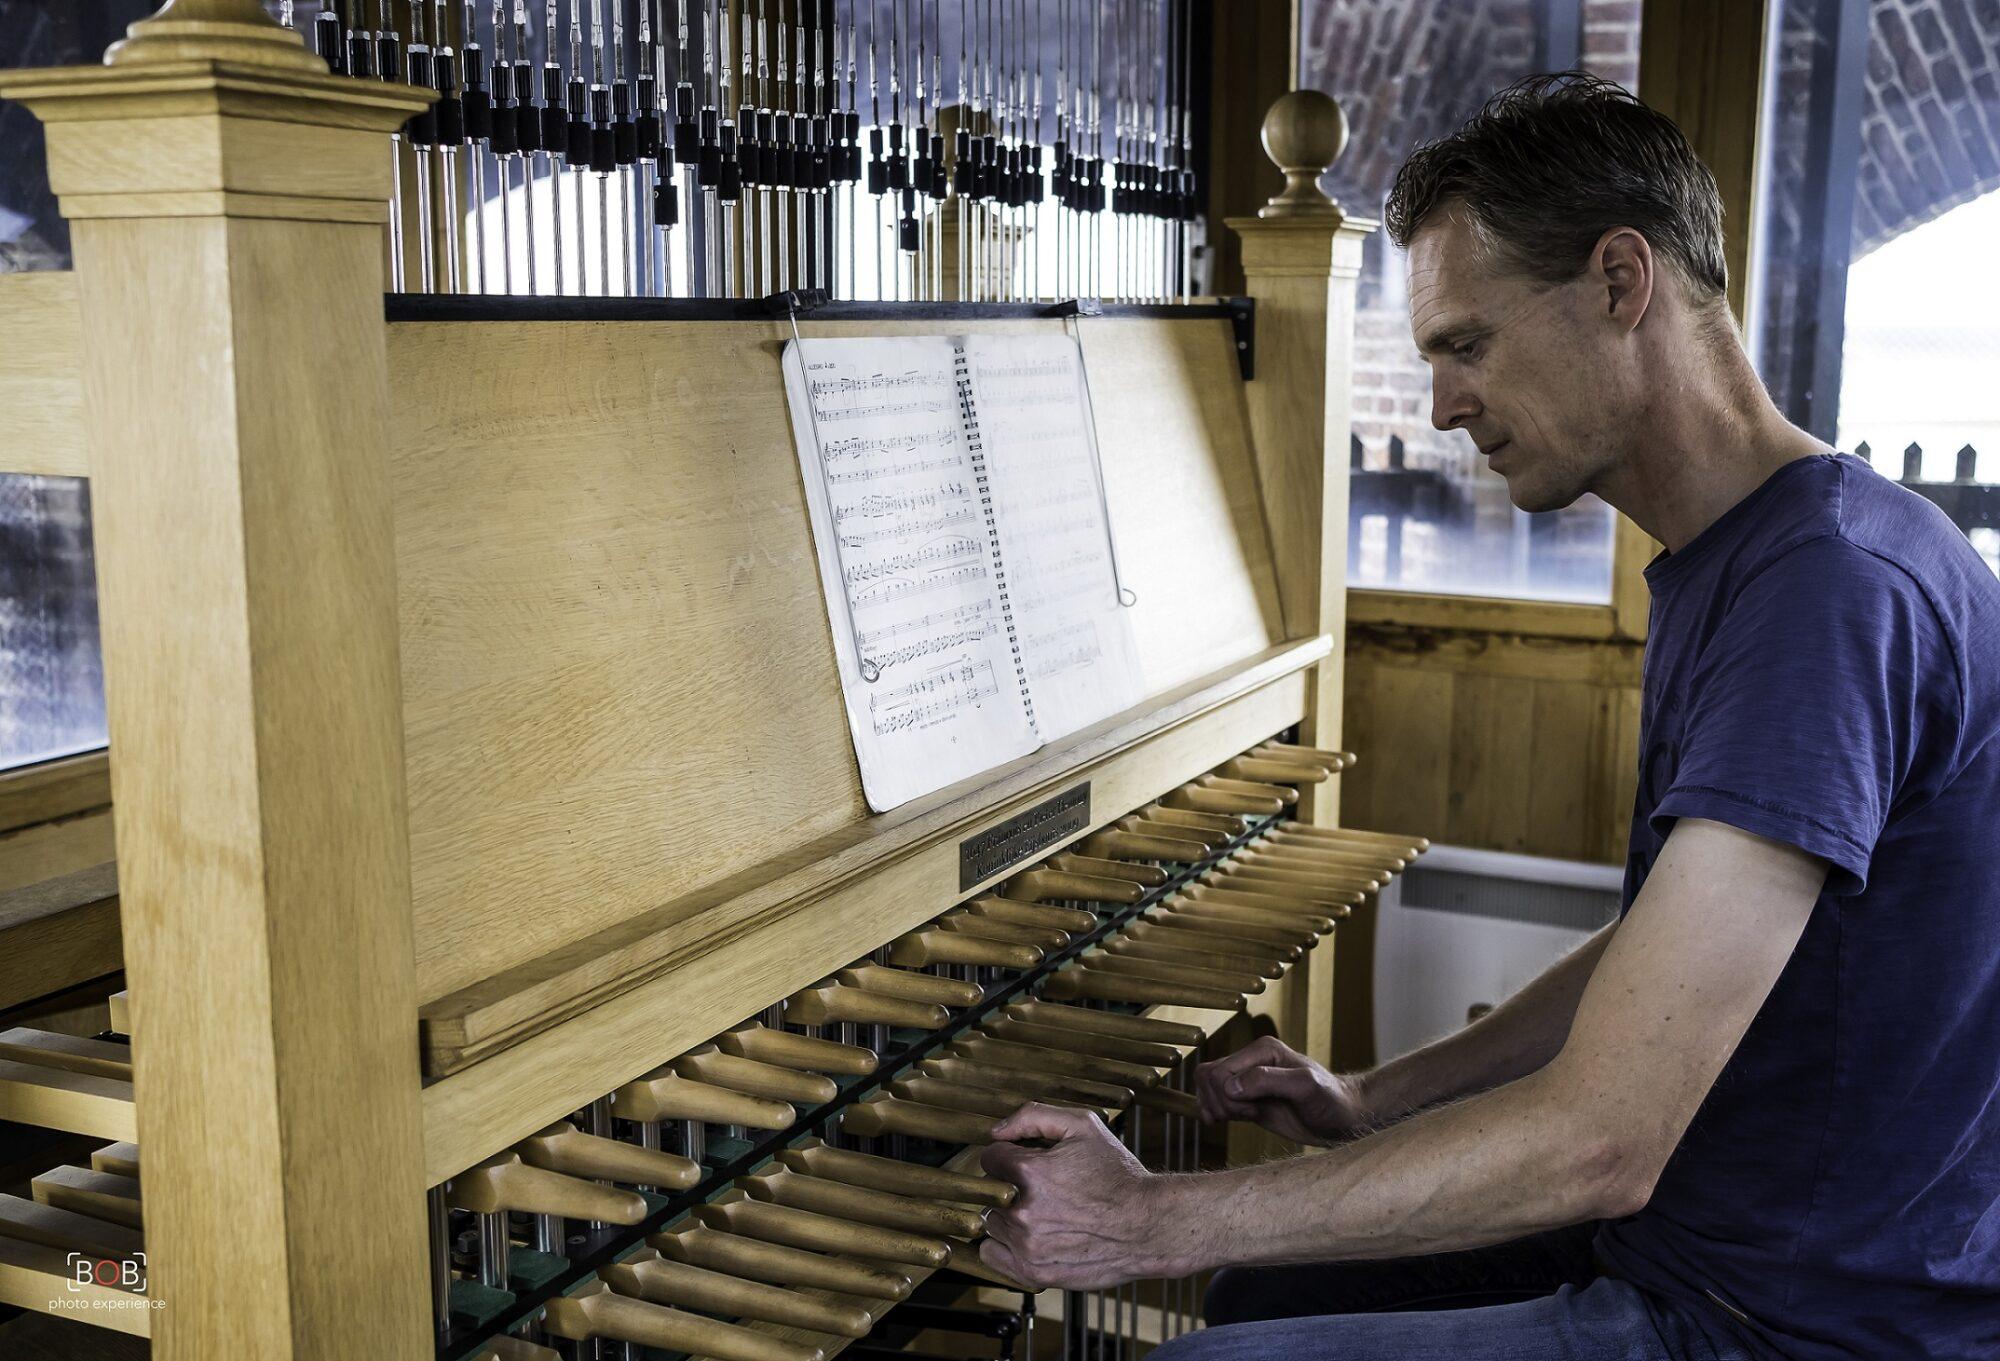 Bach op het carillon